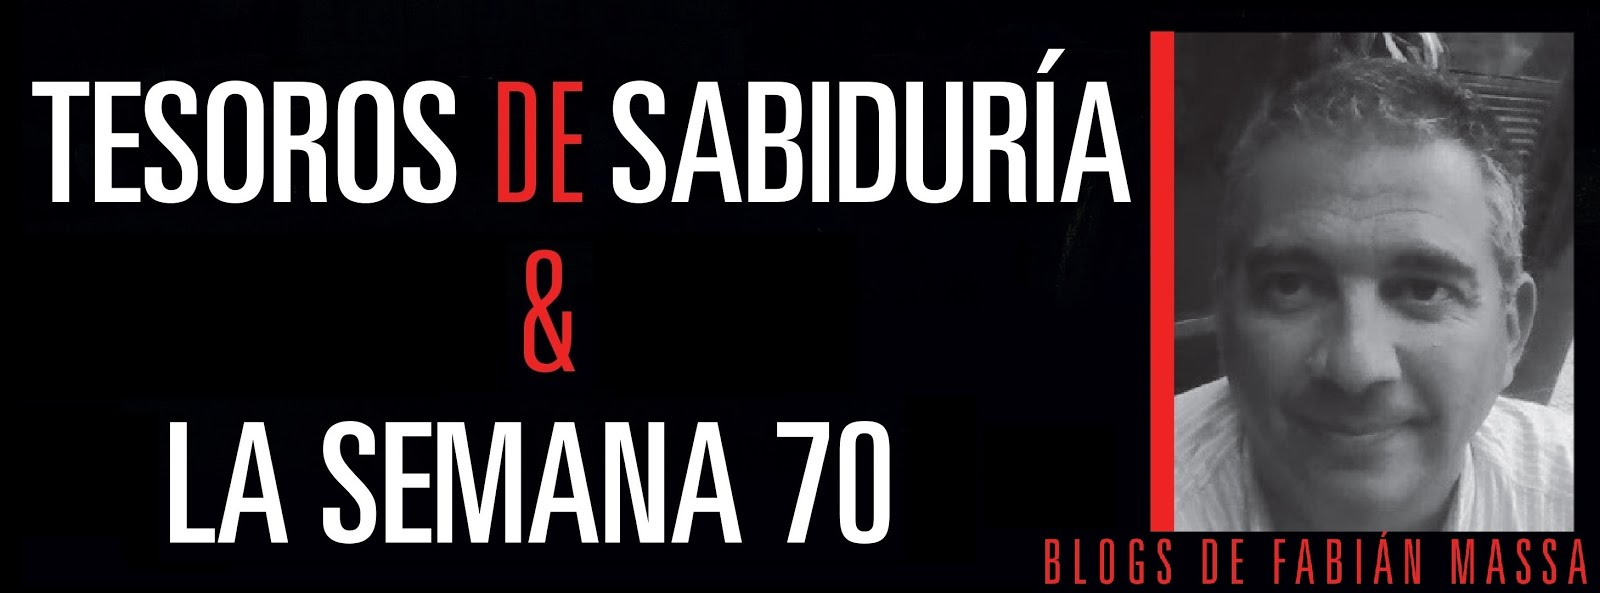 La Semana 70 - Tesoros de Sabiduria - Blogs de Fabian Massa